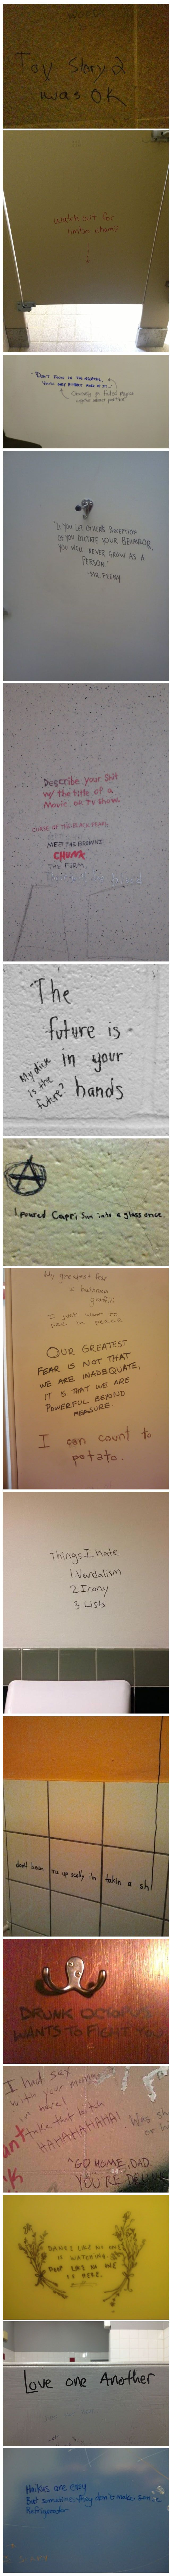 Bathroom wall writings - Bathroom Graffiti Is Hilarious